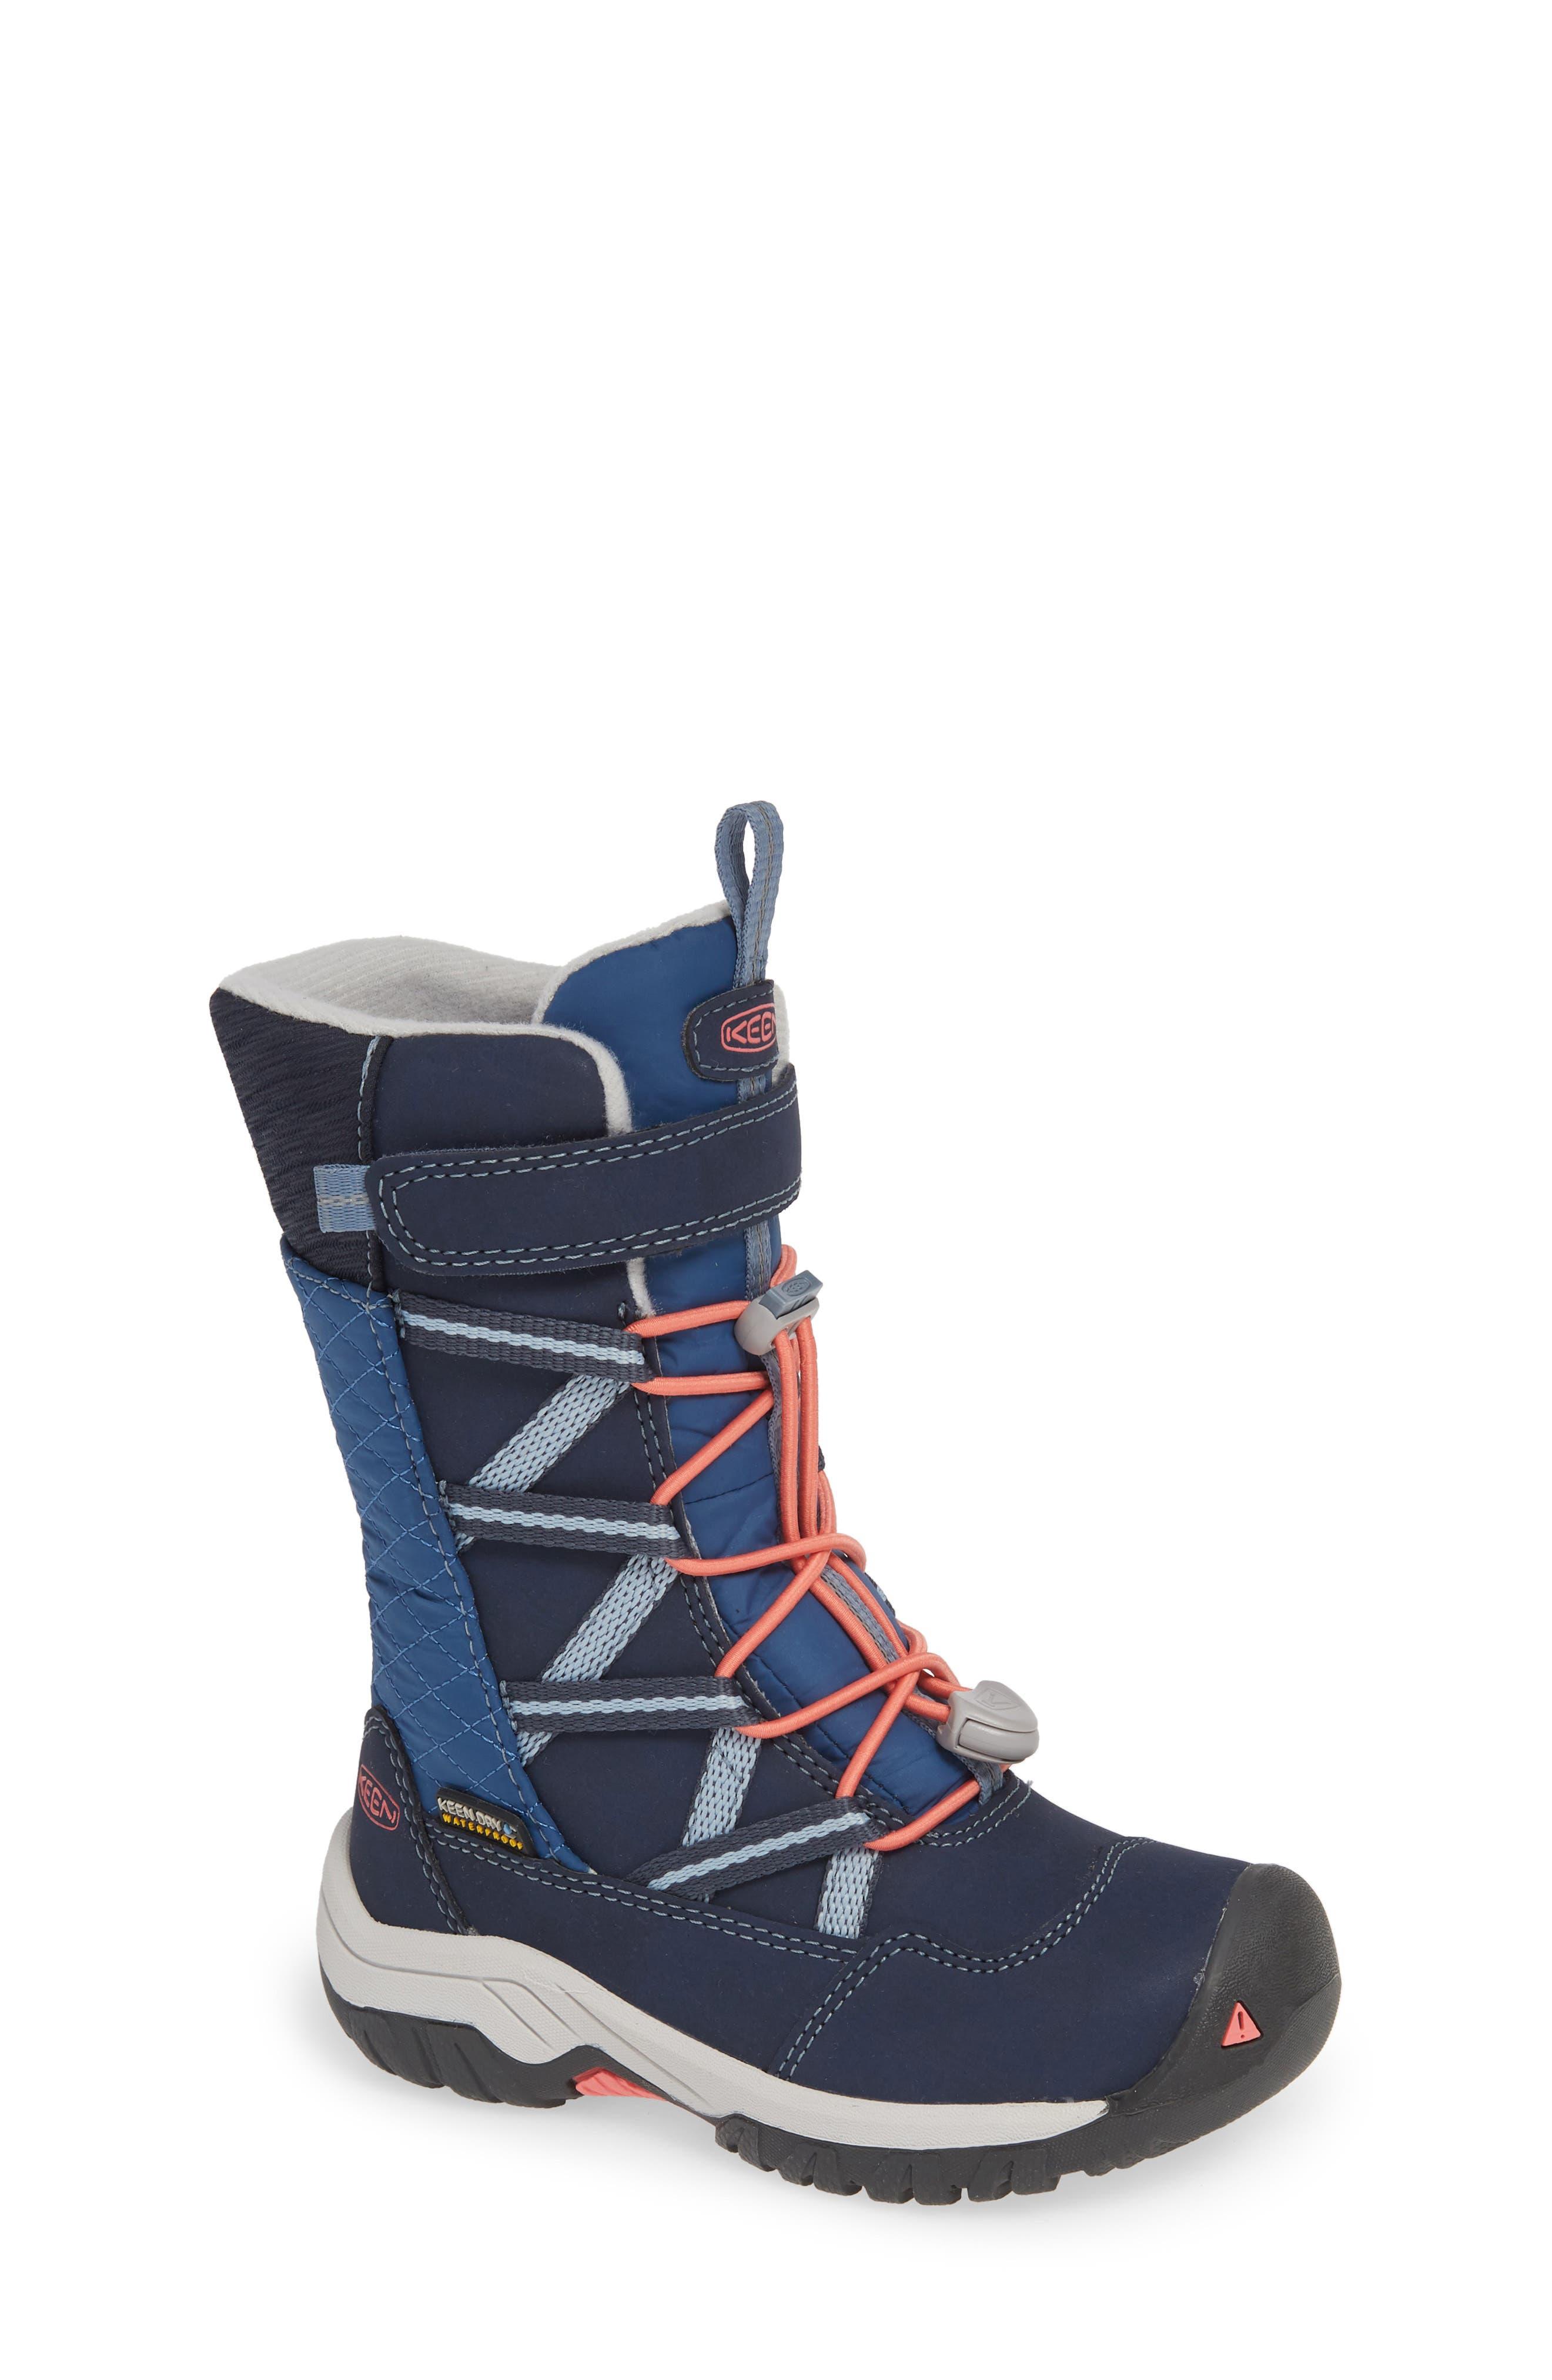 Keen Hoodoo Waterproof Insulated Boot